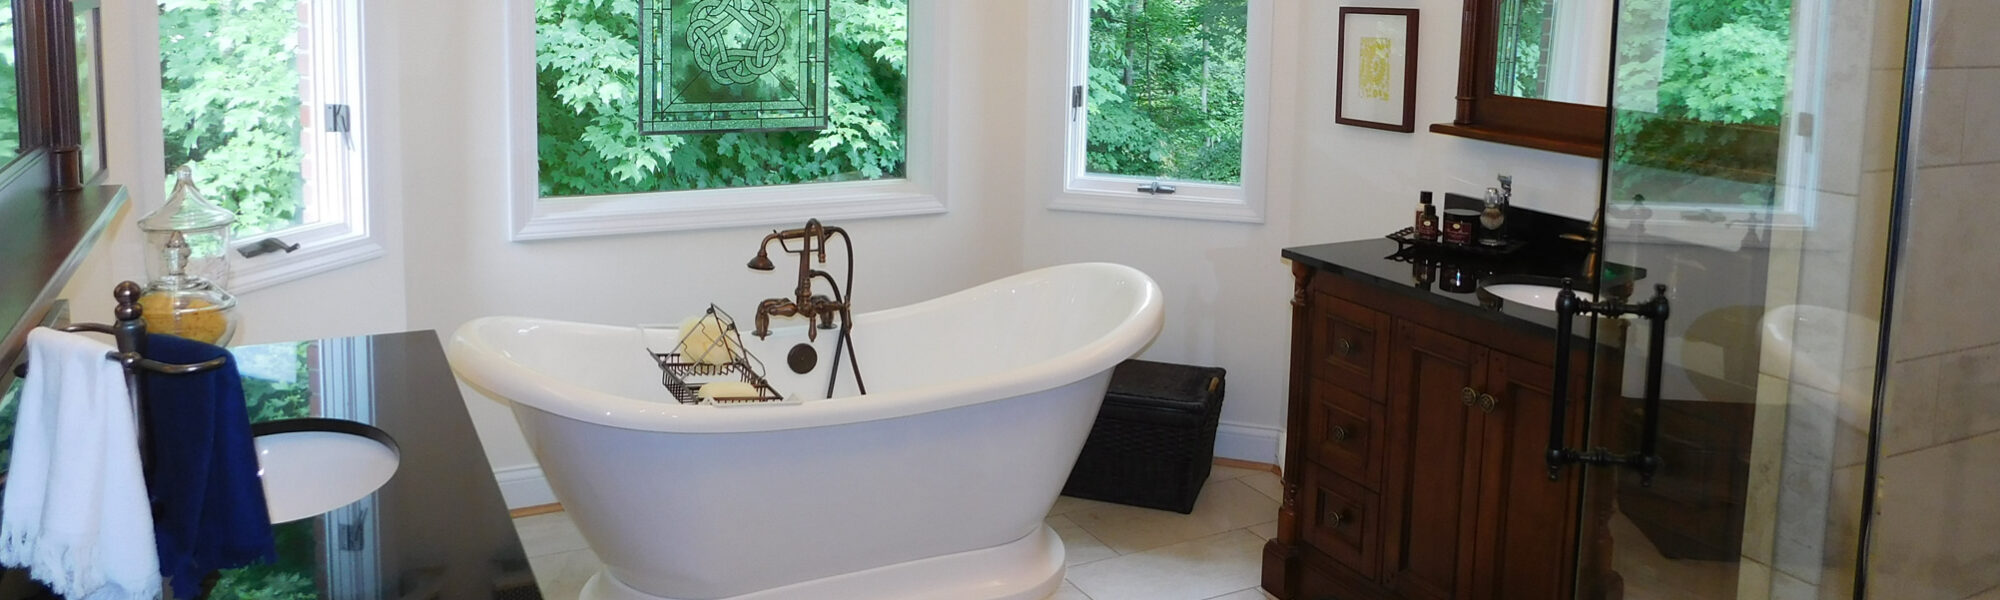 Bath Remodels - Soaking Tub